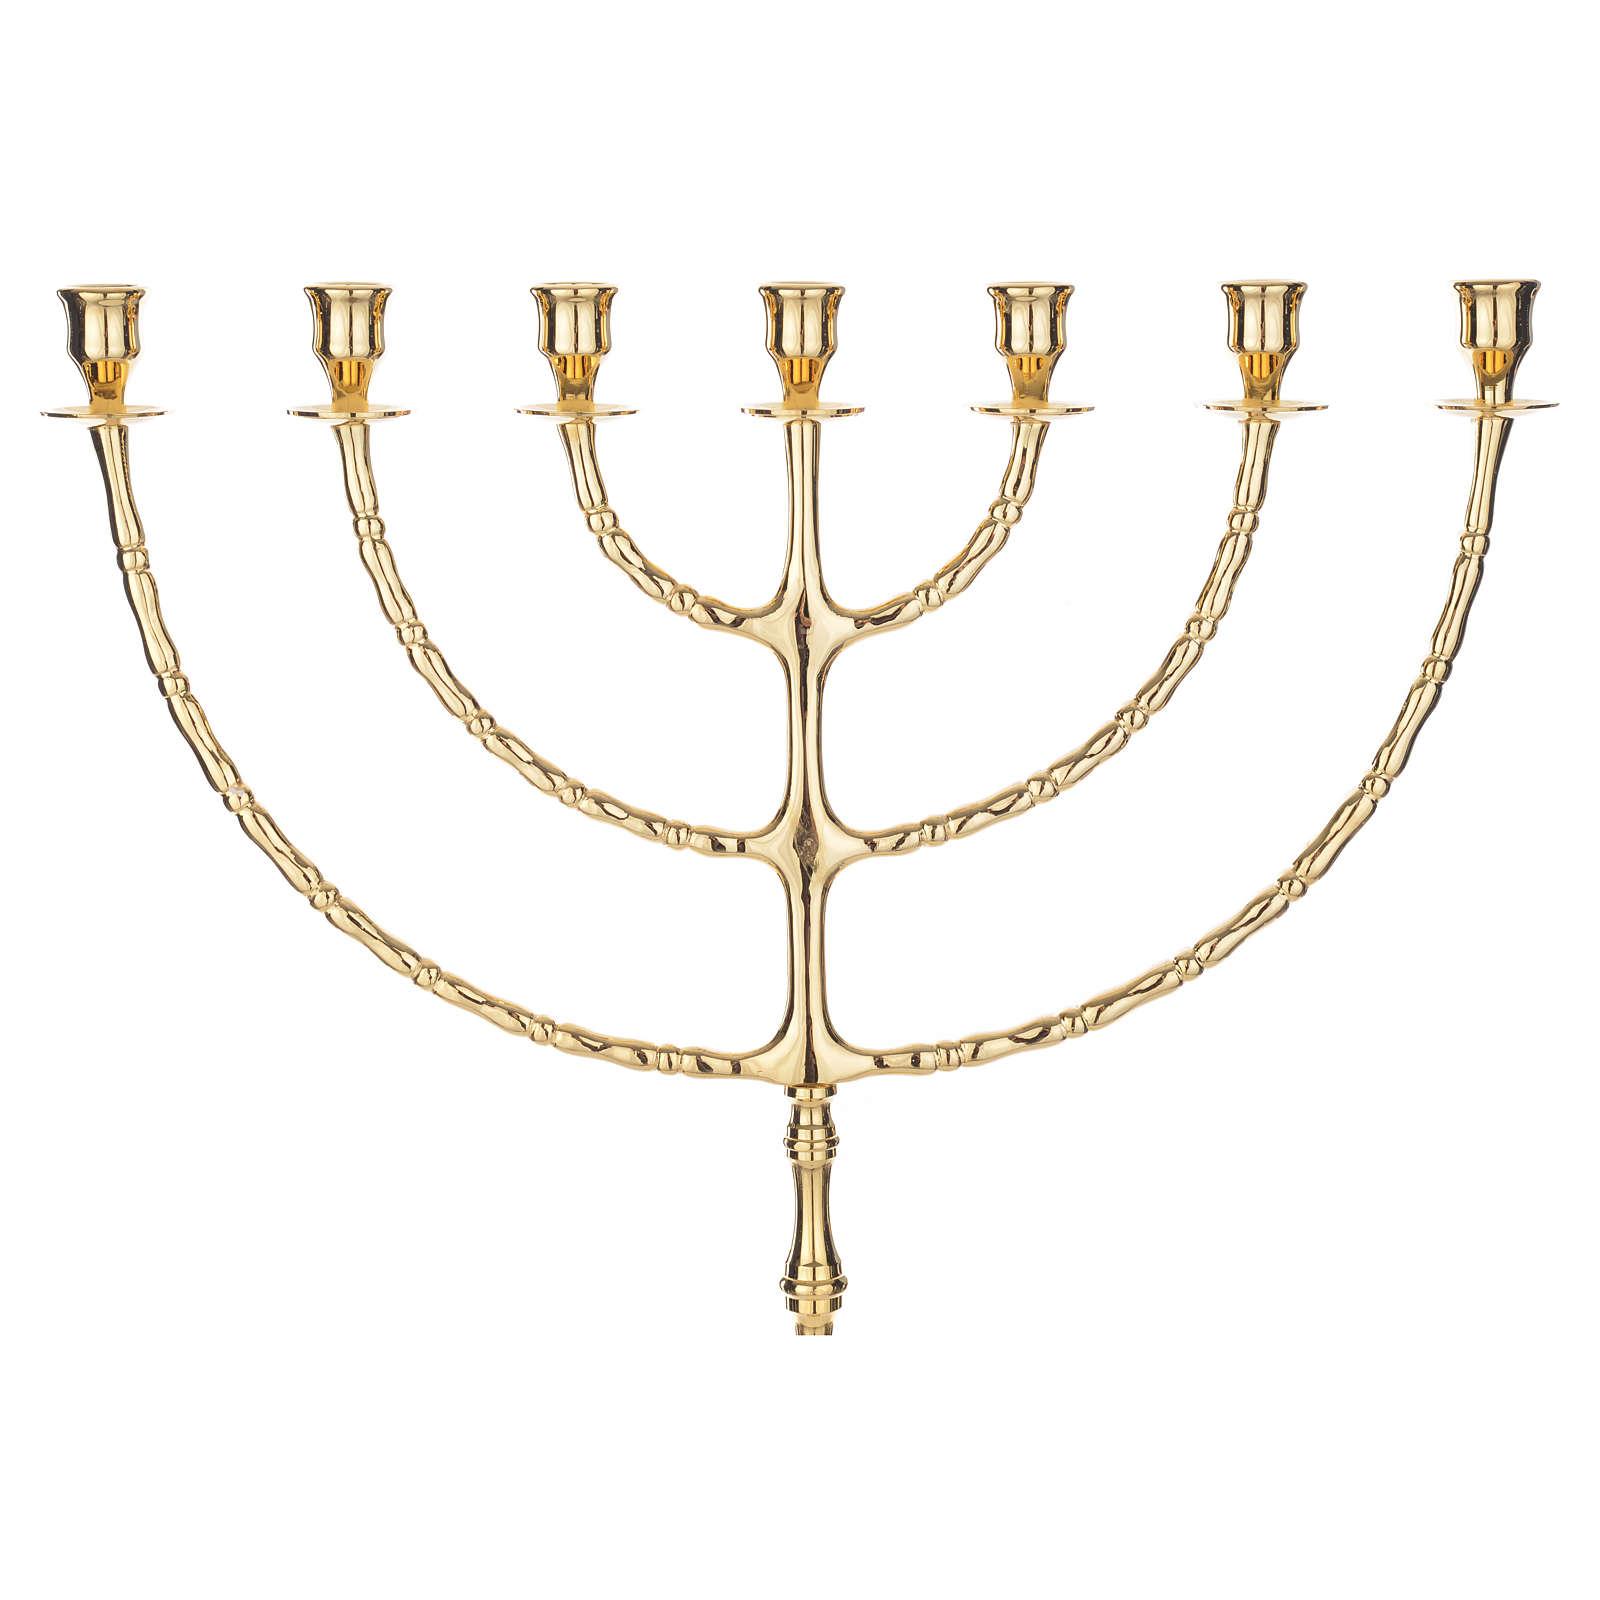 Menorah 7 branches en laiton doré 4